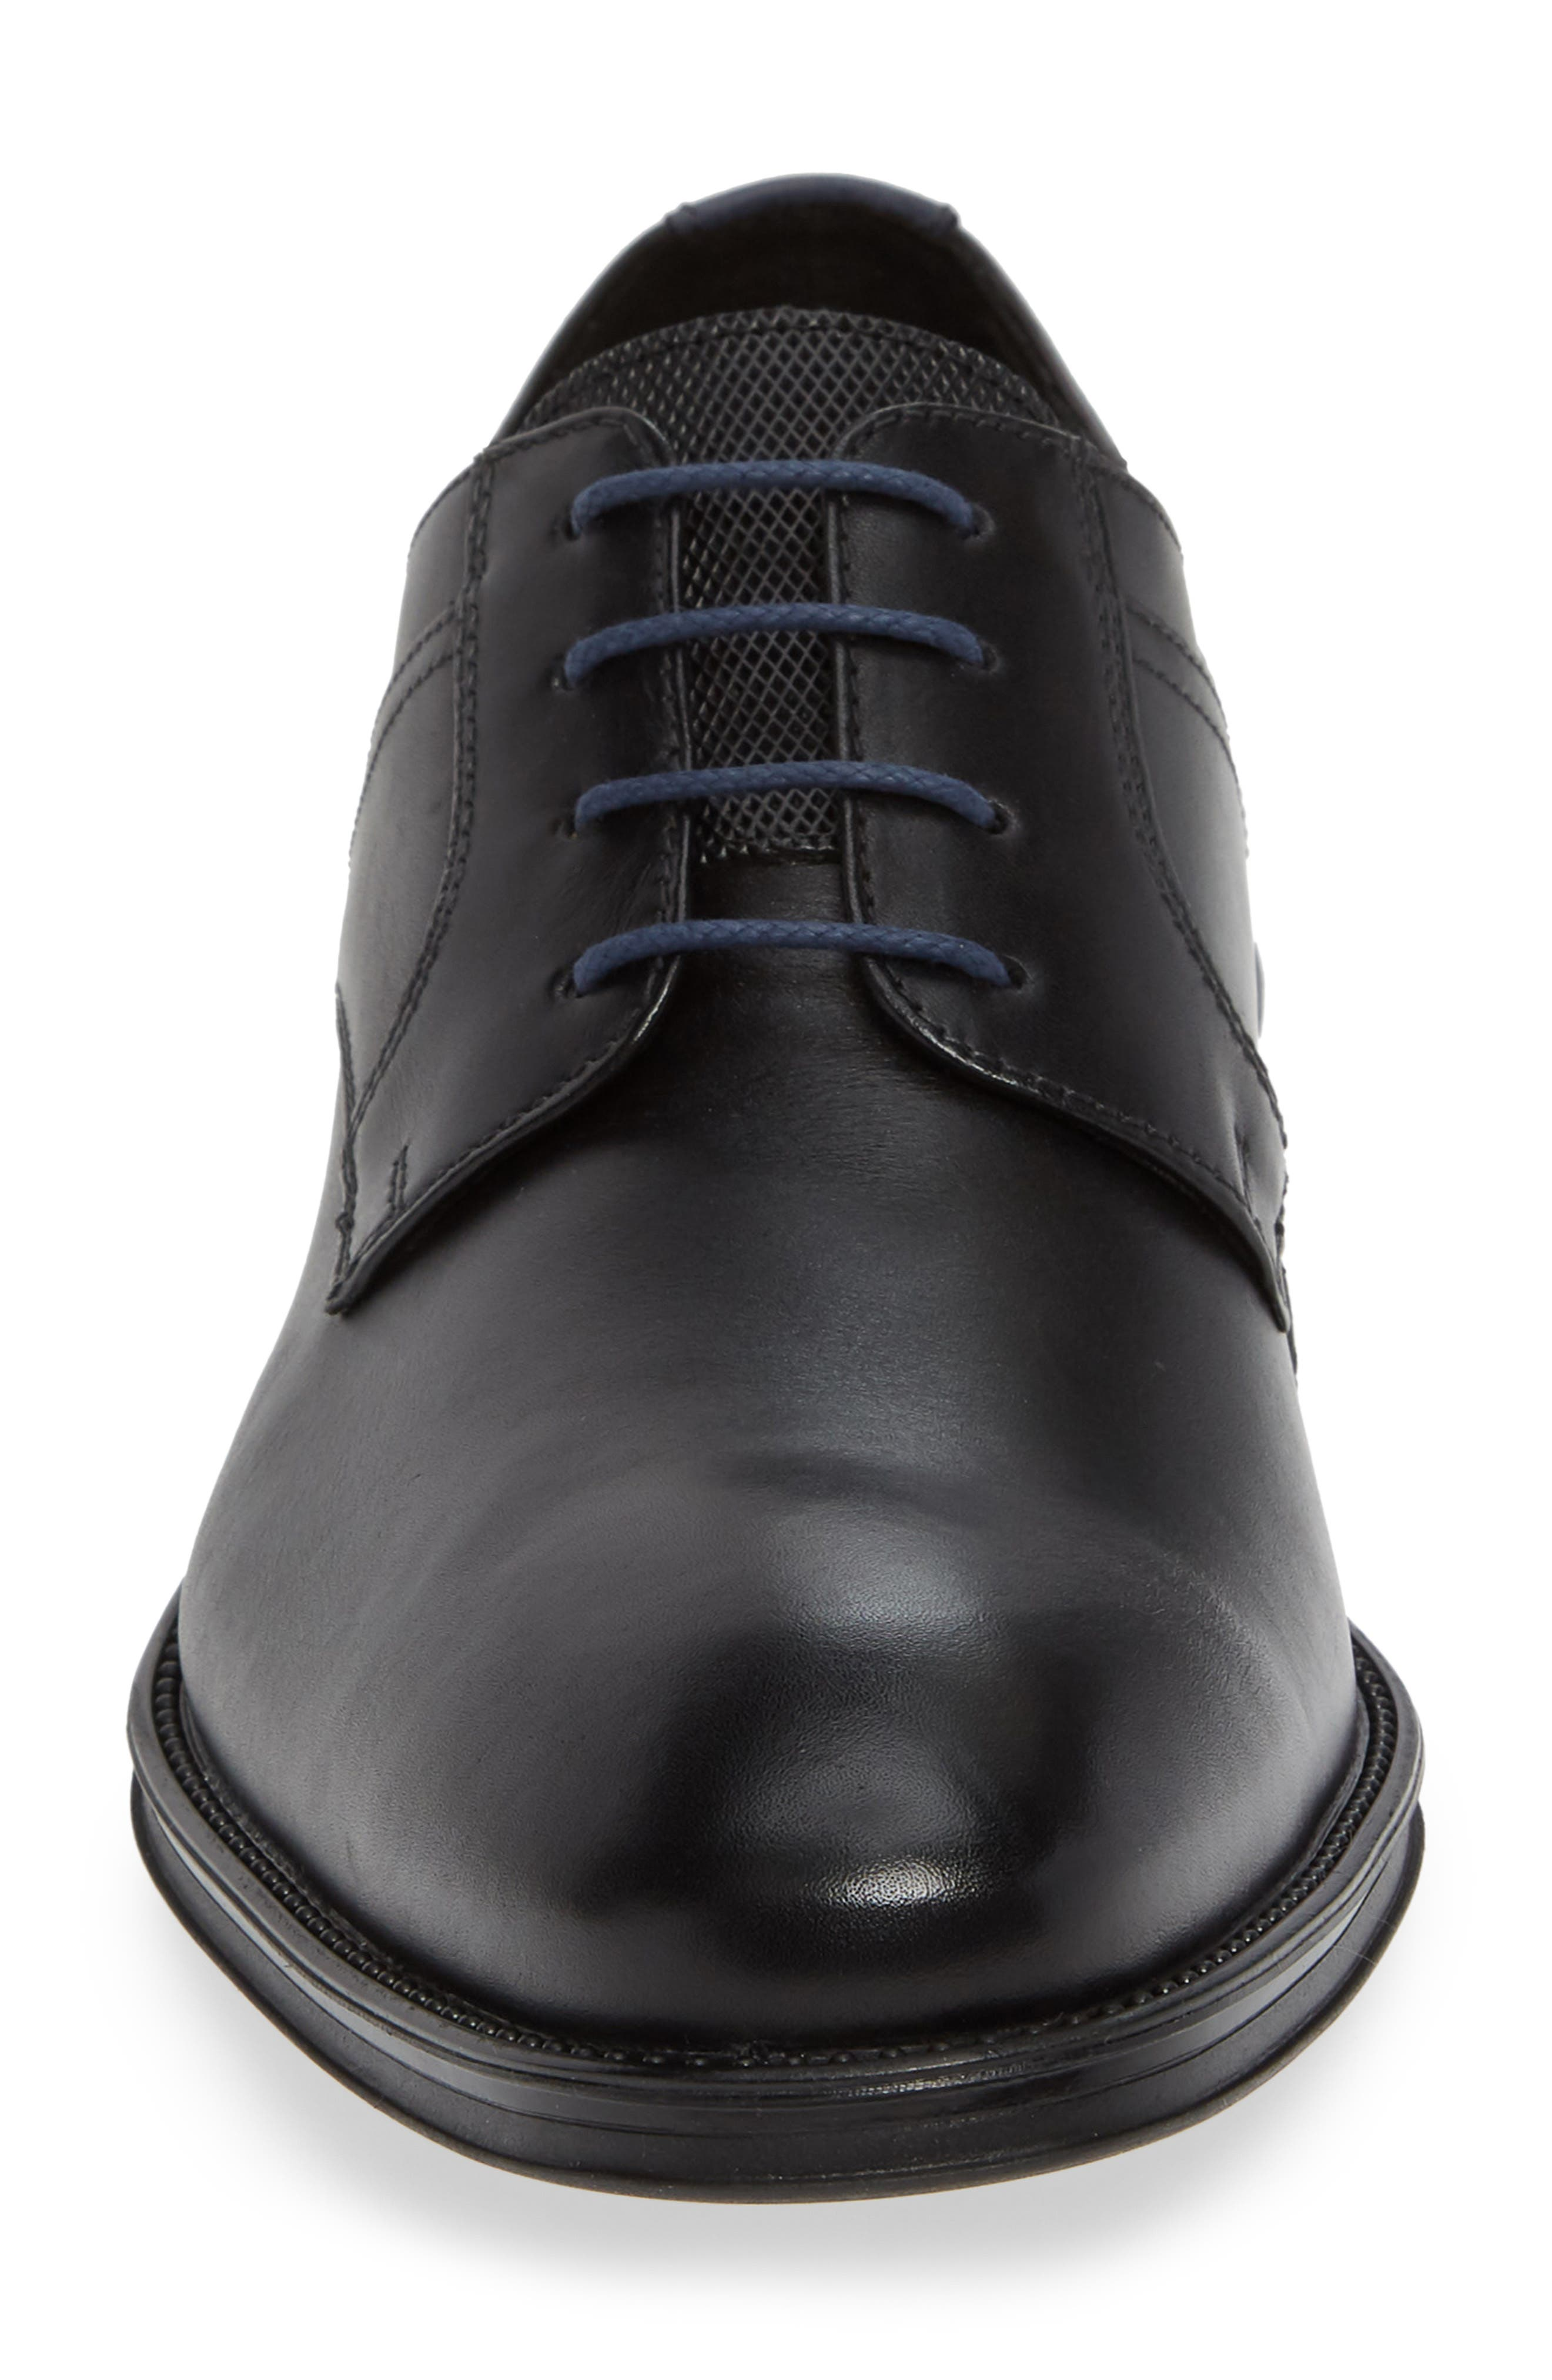 Gala Plain Toe Derby,                             Alternate thumbnail 4, color,                             BLACK/ MIDNIGHT LEATHER